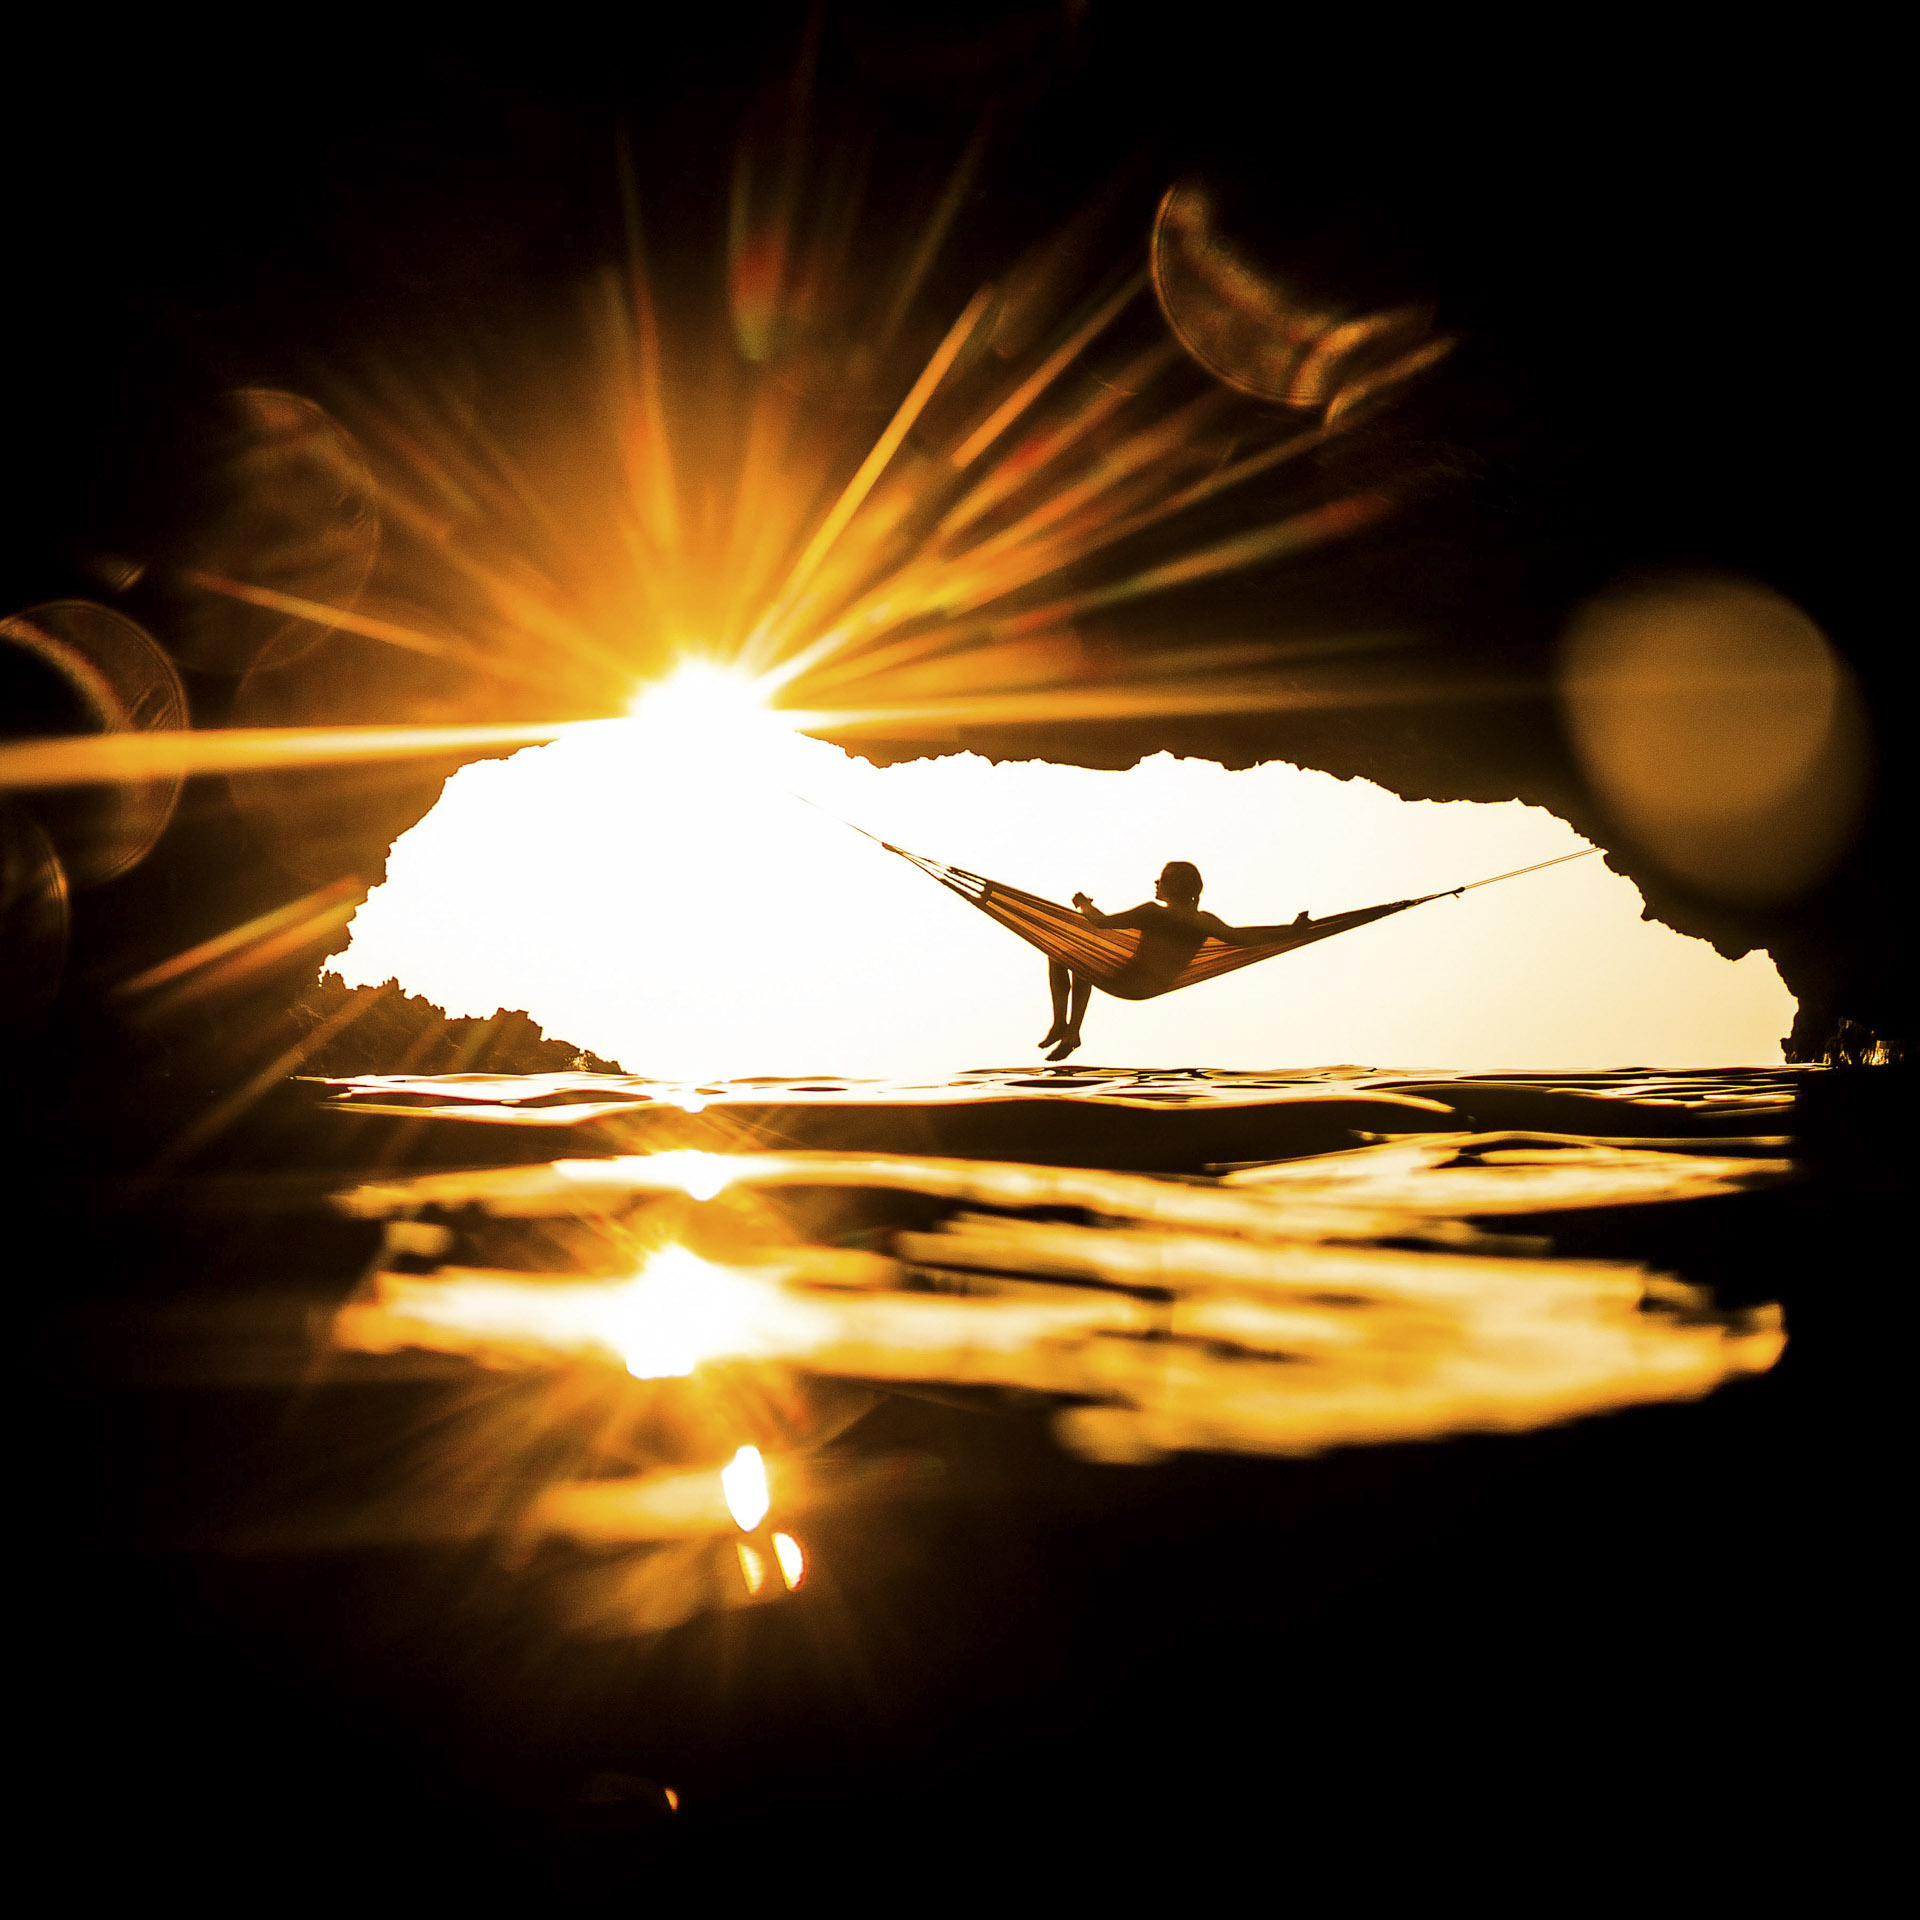 SarahLeePhoto_Sunset_Hammock_Cave.jpg